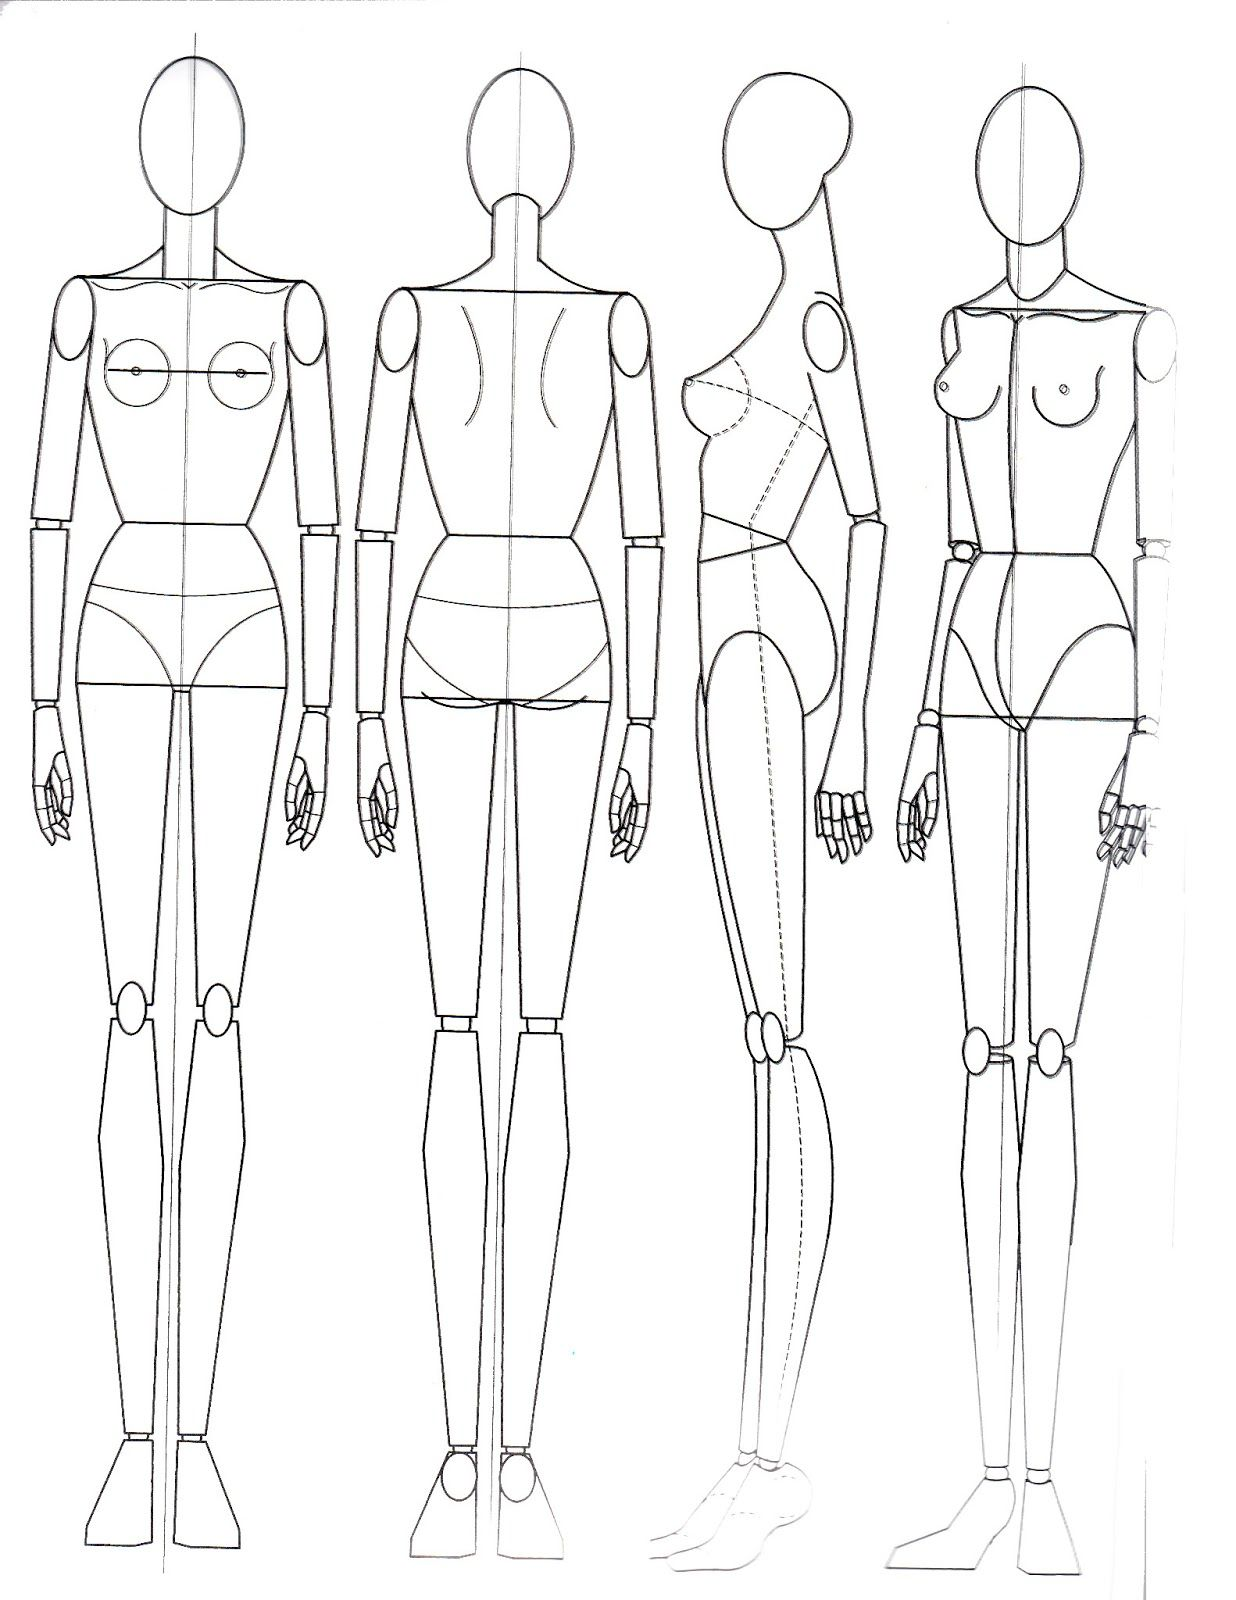 fashion figures drawing - Google Search | эскизы | Pinterest ...